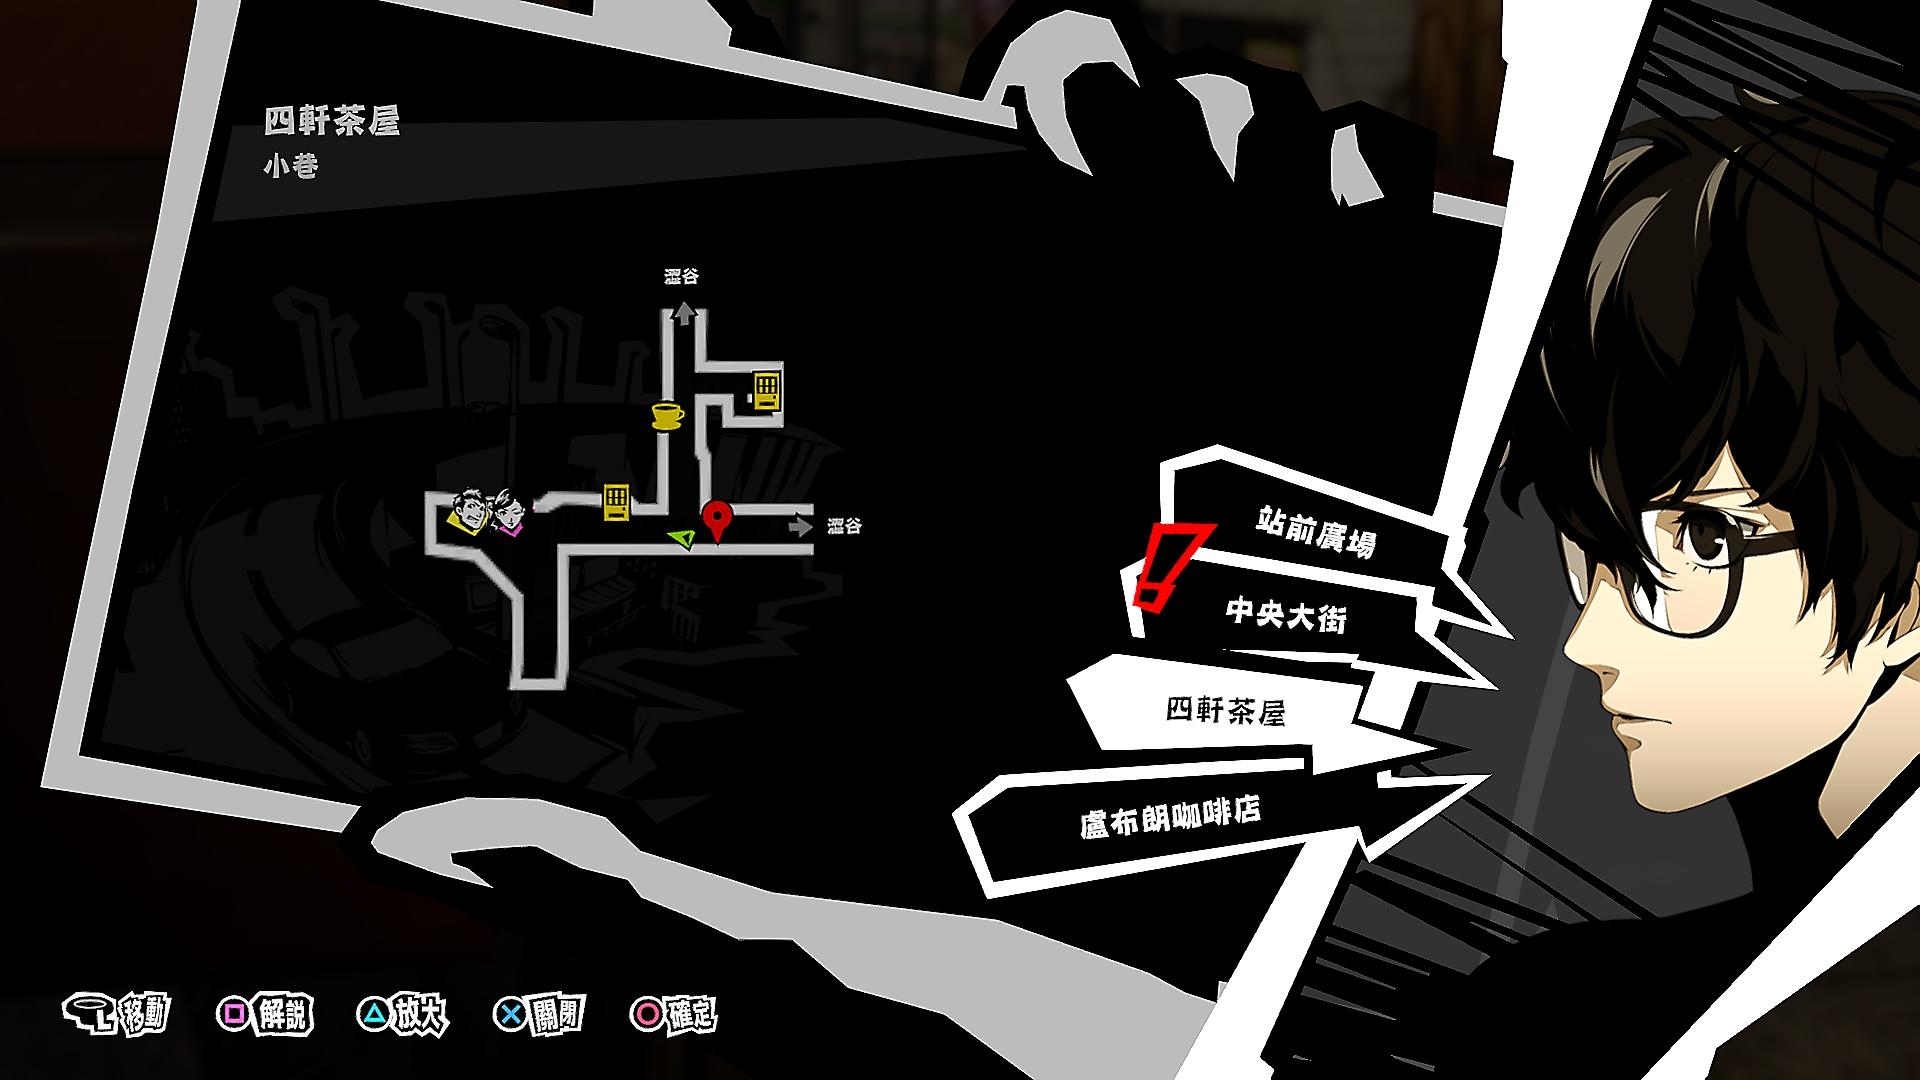 Persona 5 STRIKERS - Gallery Screenshot 5